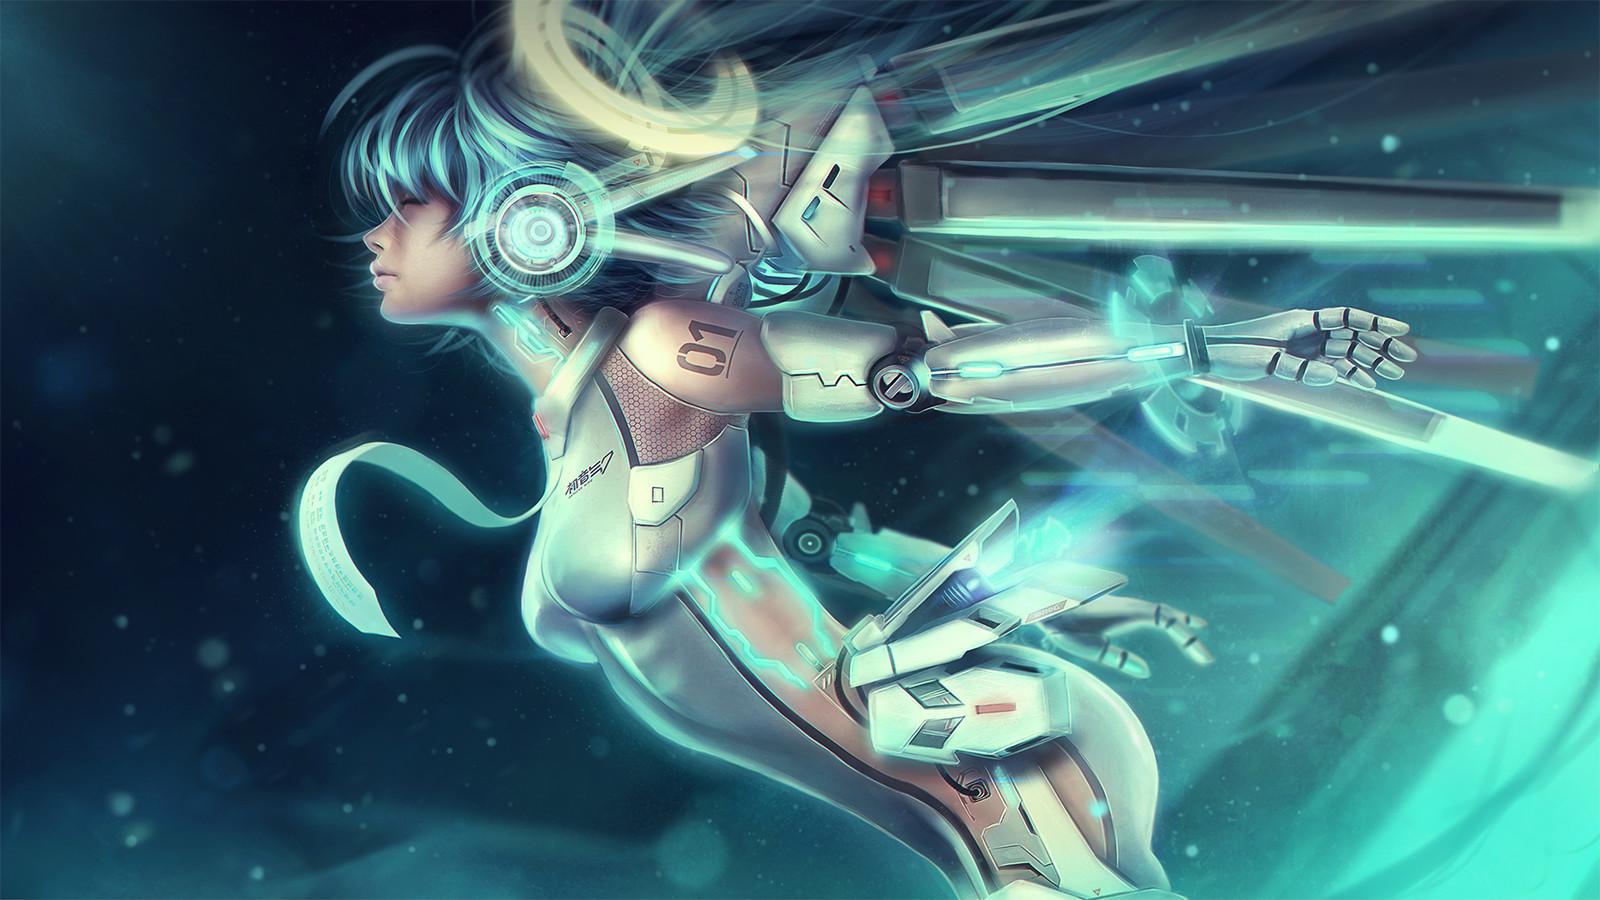 Cyber Miku 01- 'Ascension'